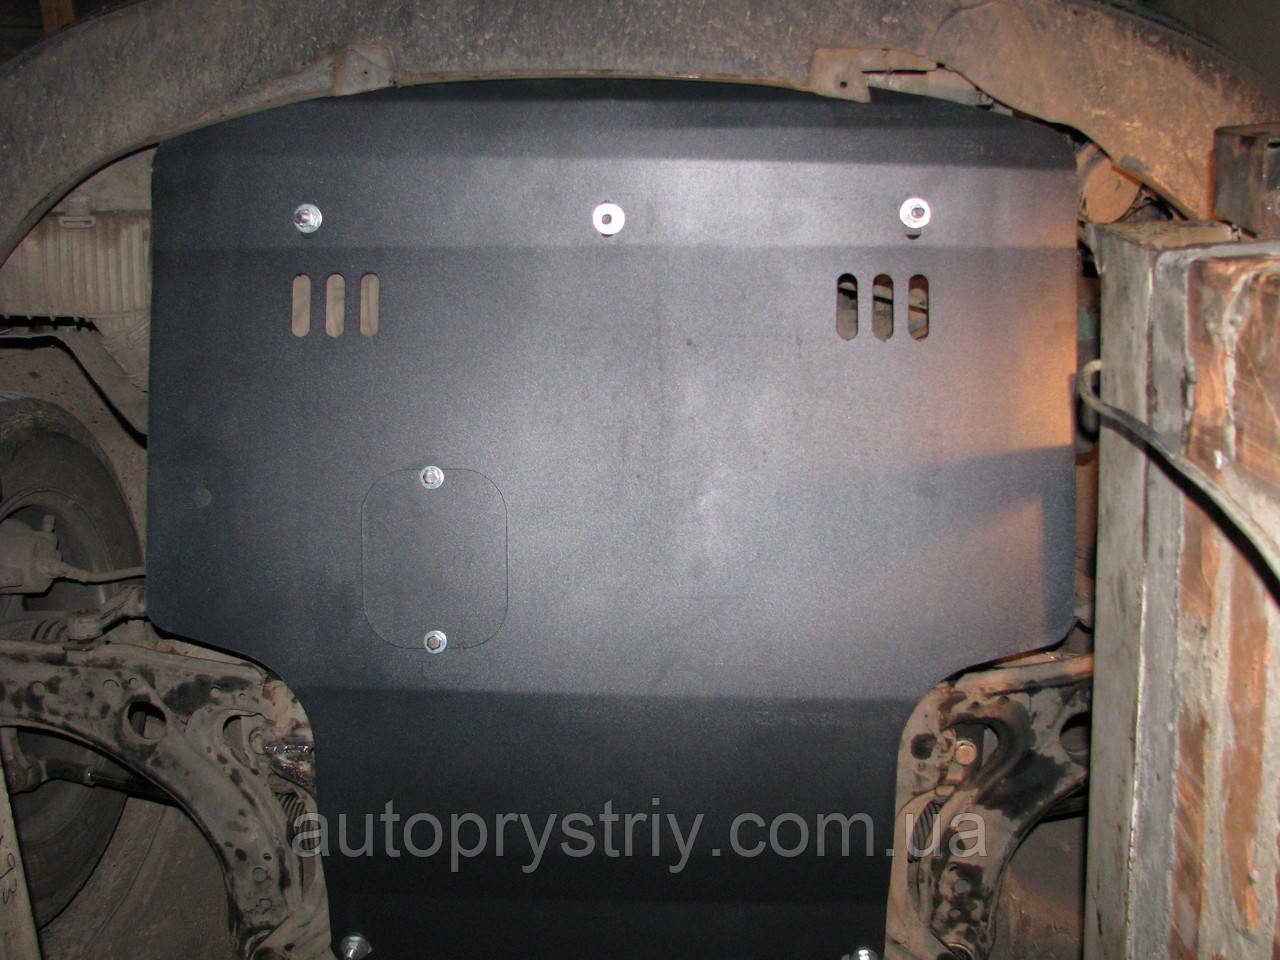 Захист двигуна і КПП Volkswagen Golf 4 (1997-2003) всі дизельні